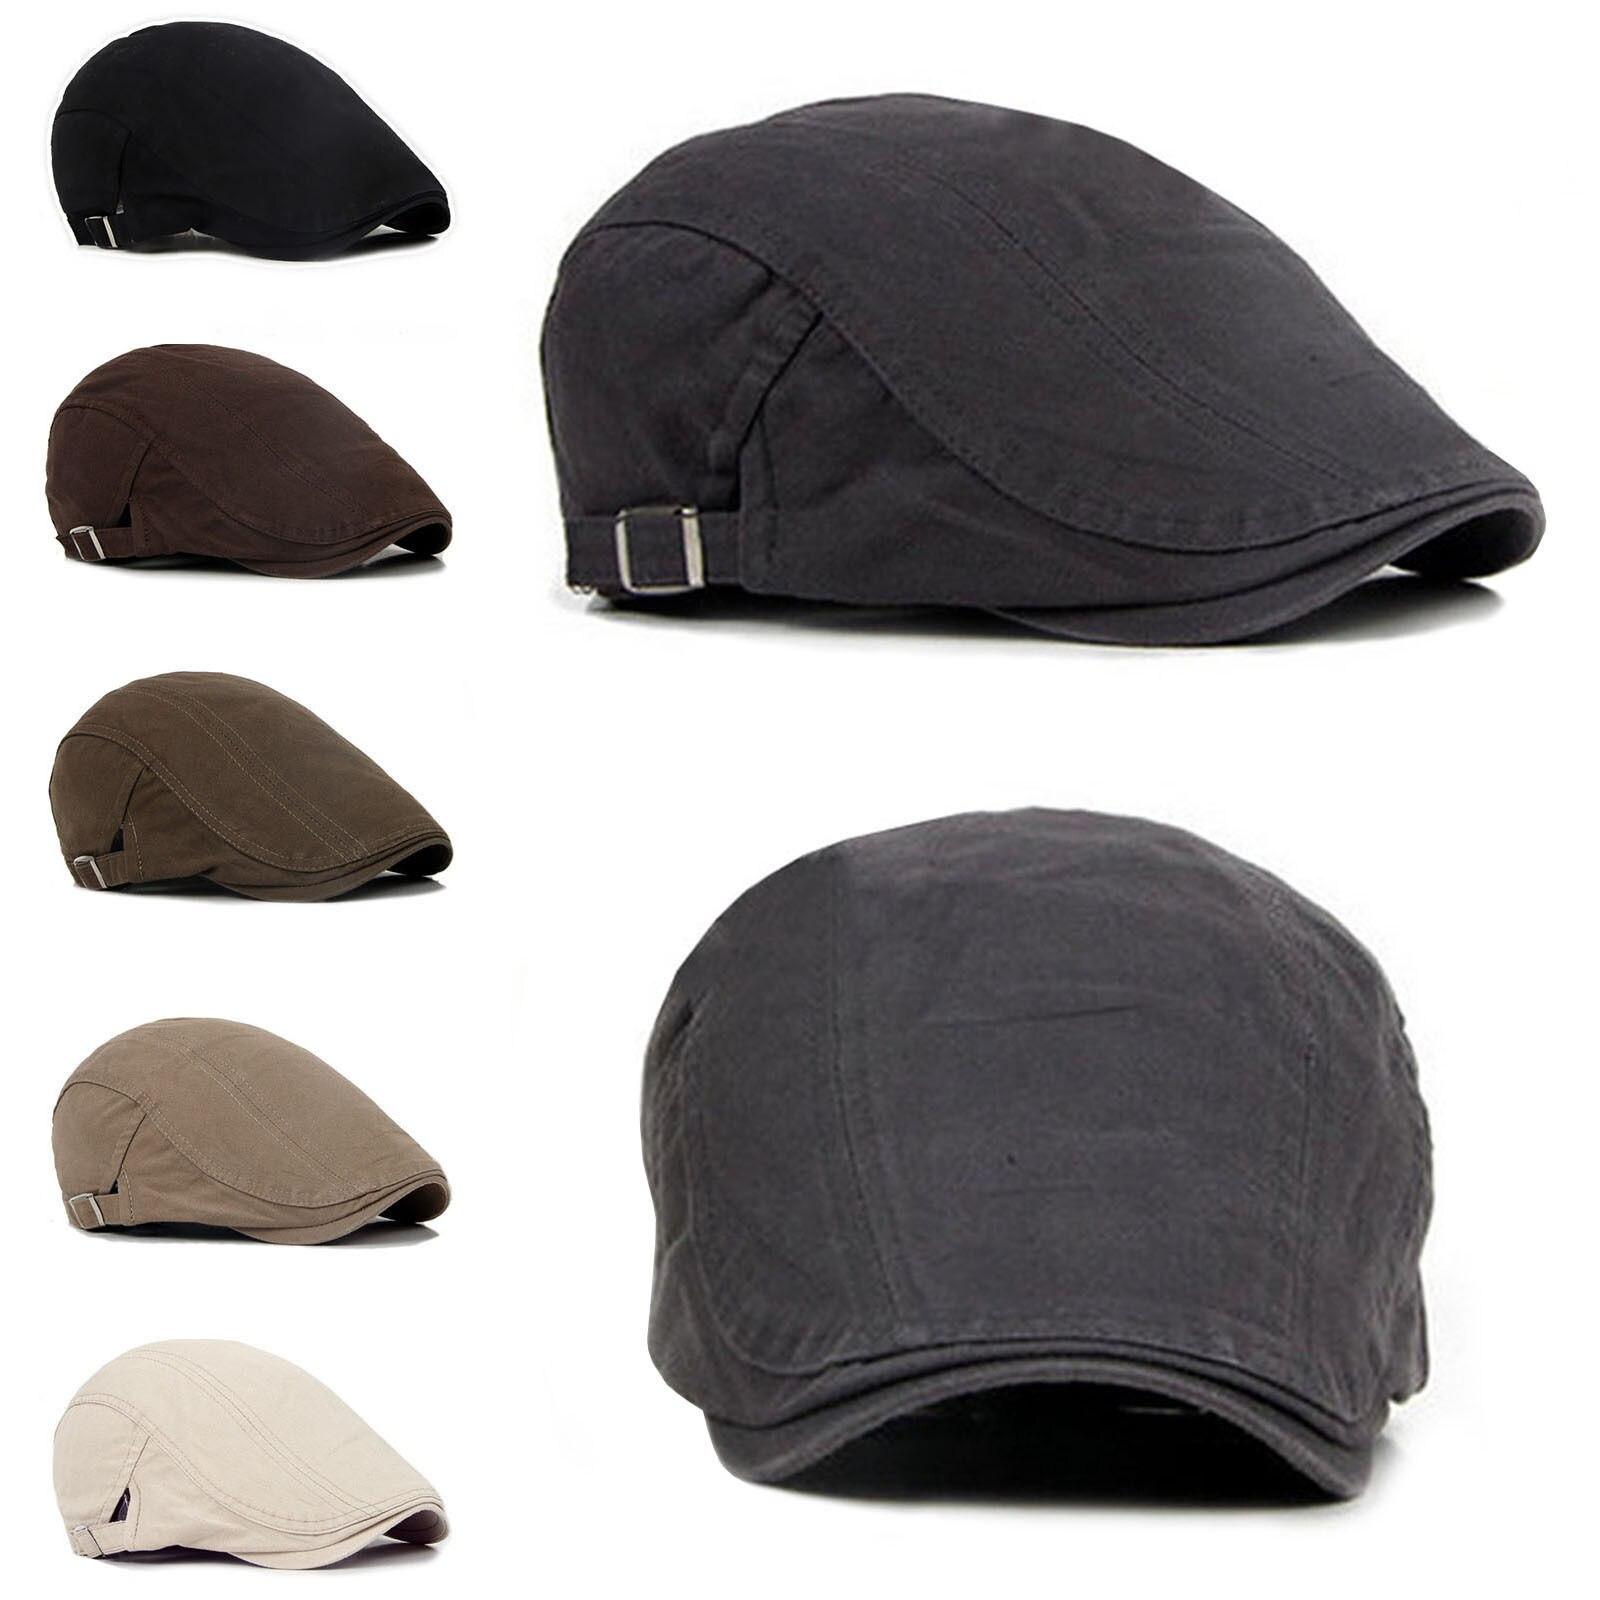 Chapéu tipo gatsby para homens, chapéu estilo golfe, boina de condutor